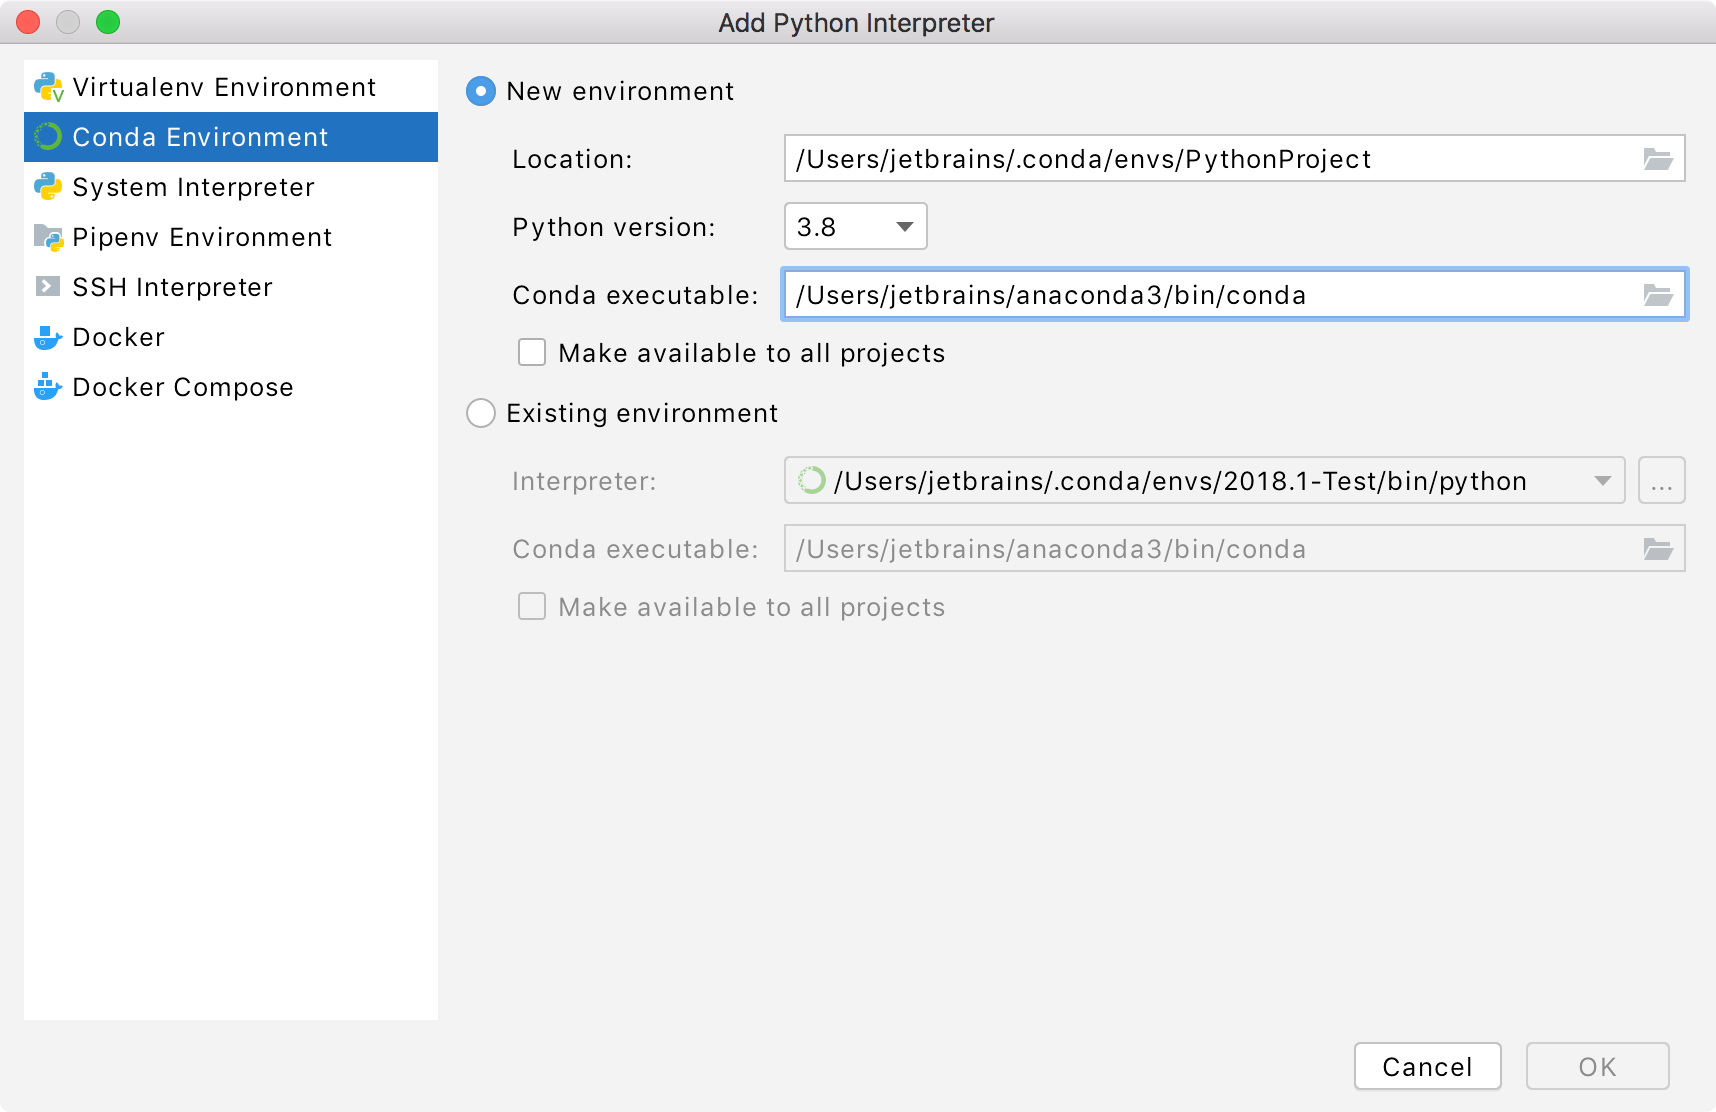 Configuring a new Python SDK